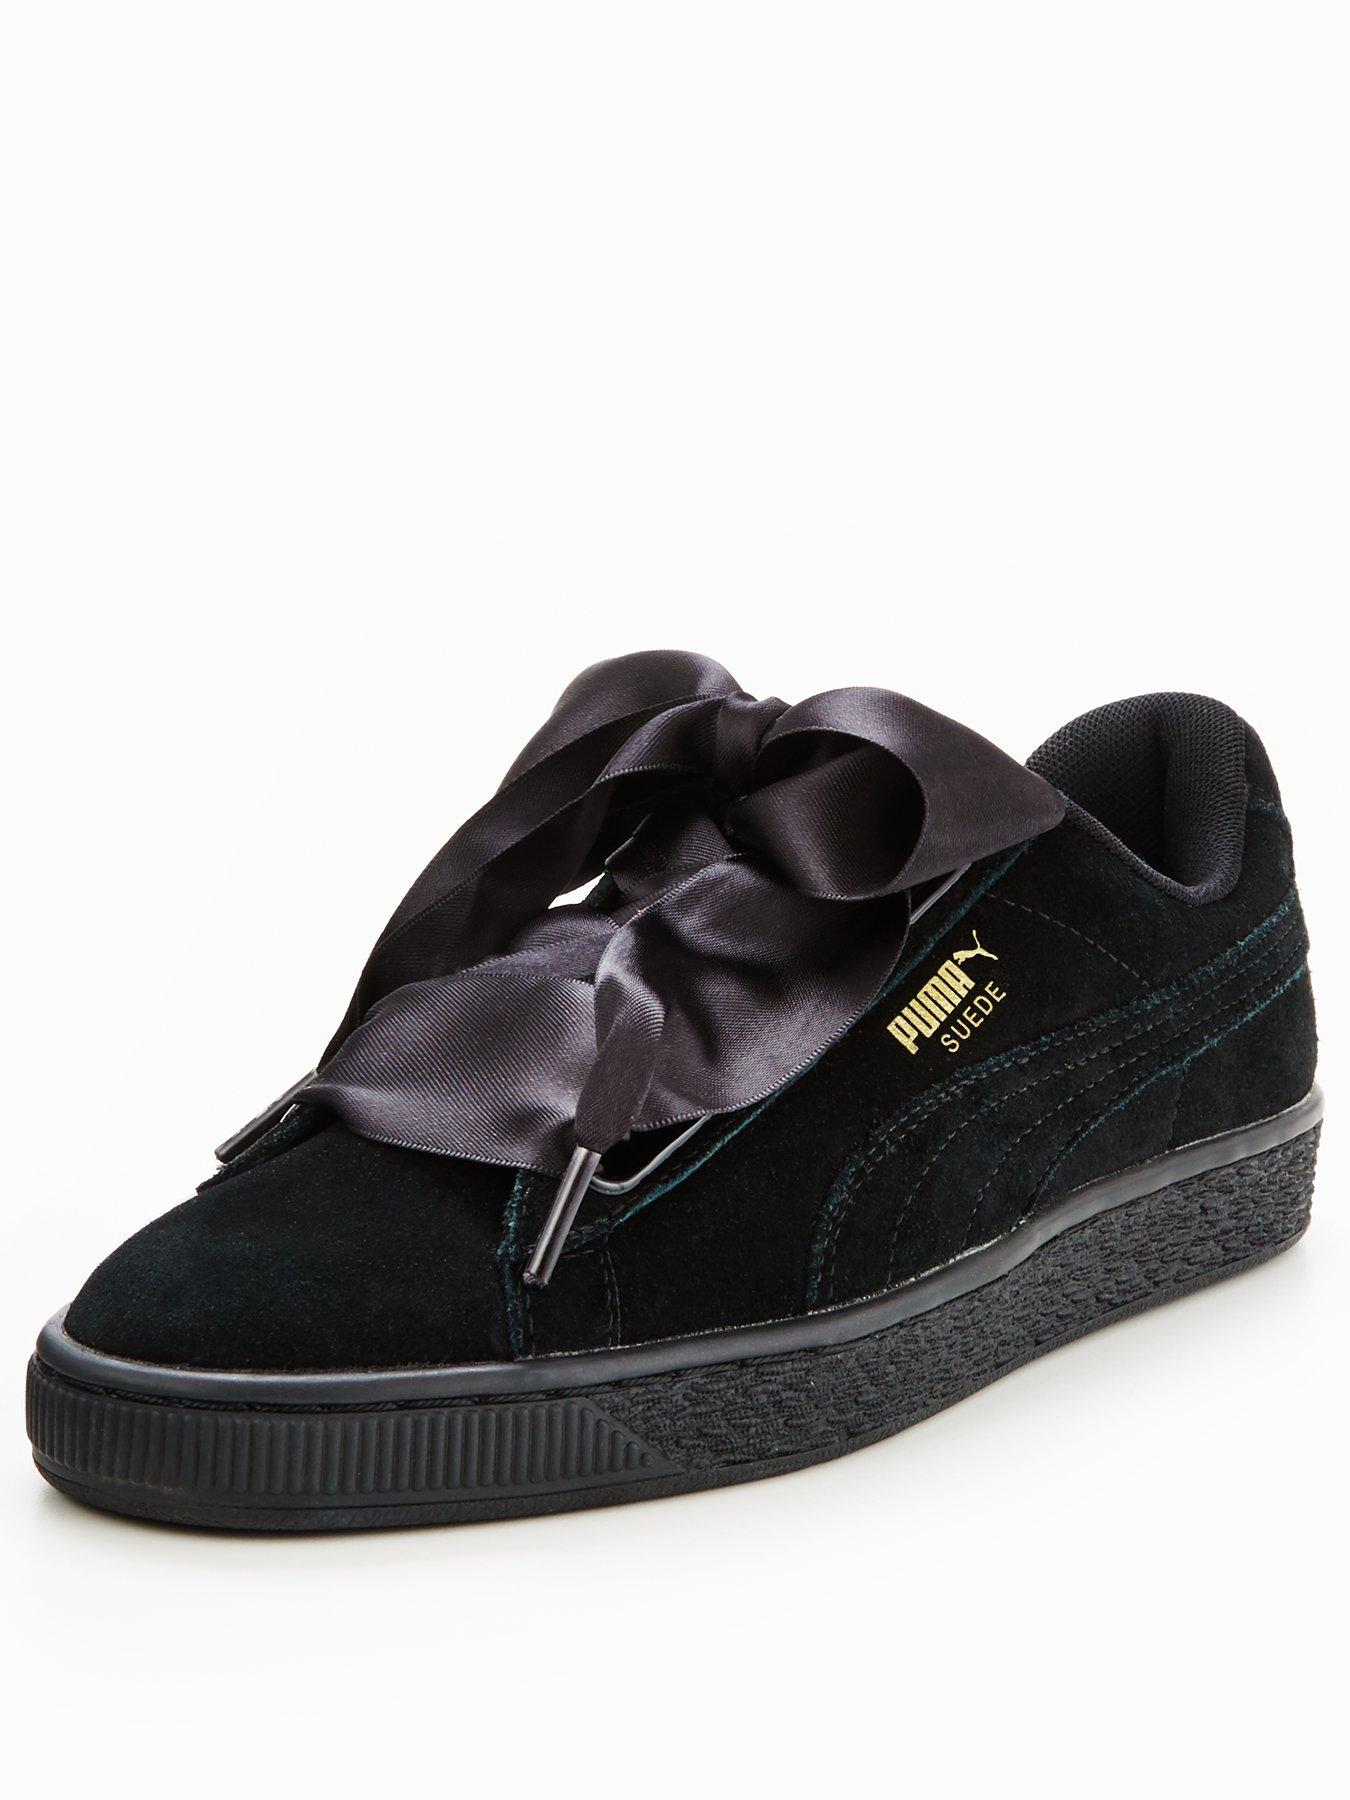 Puma Suede Heart Satin Ii 1600167507 Women's Shoes Puma Trainers